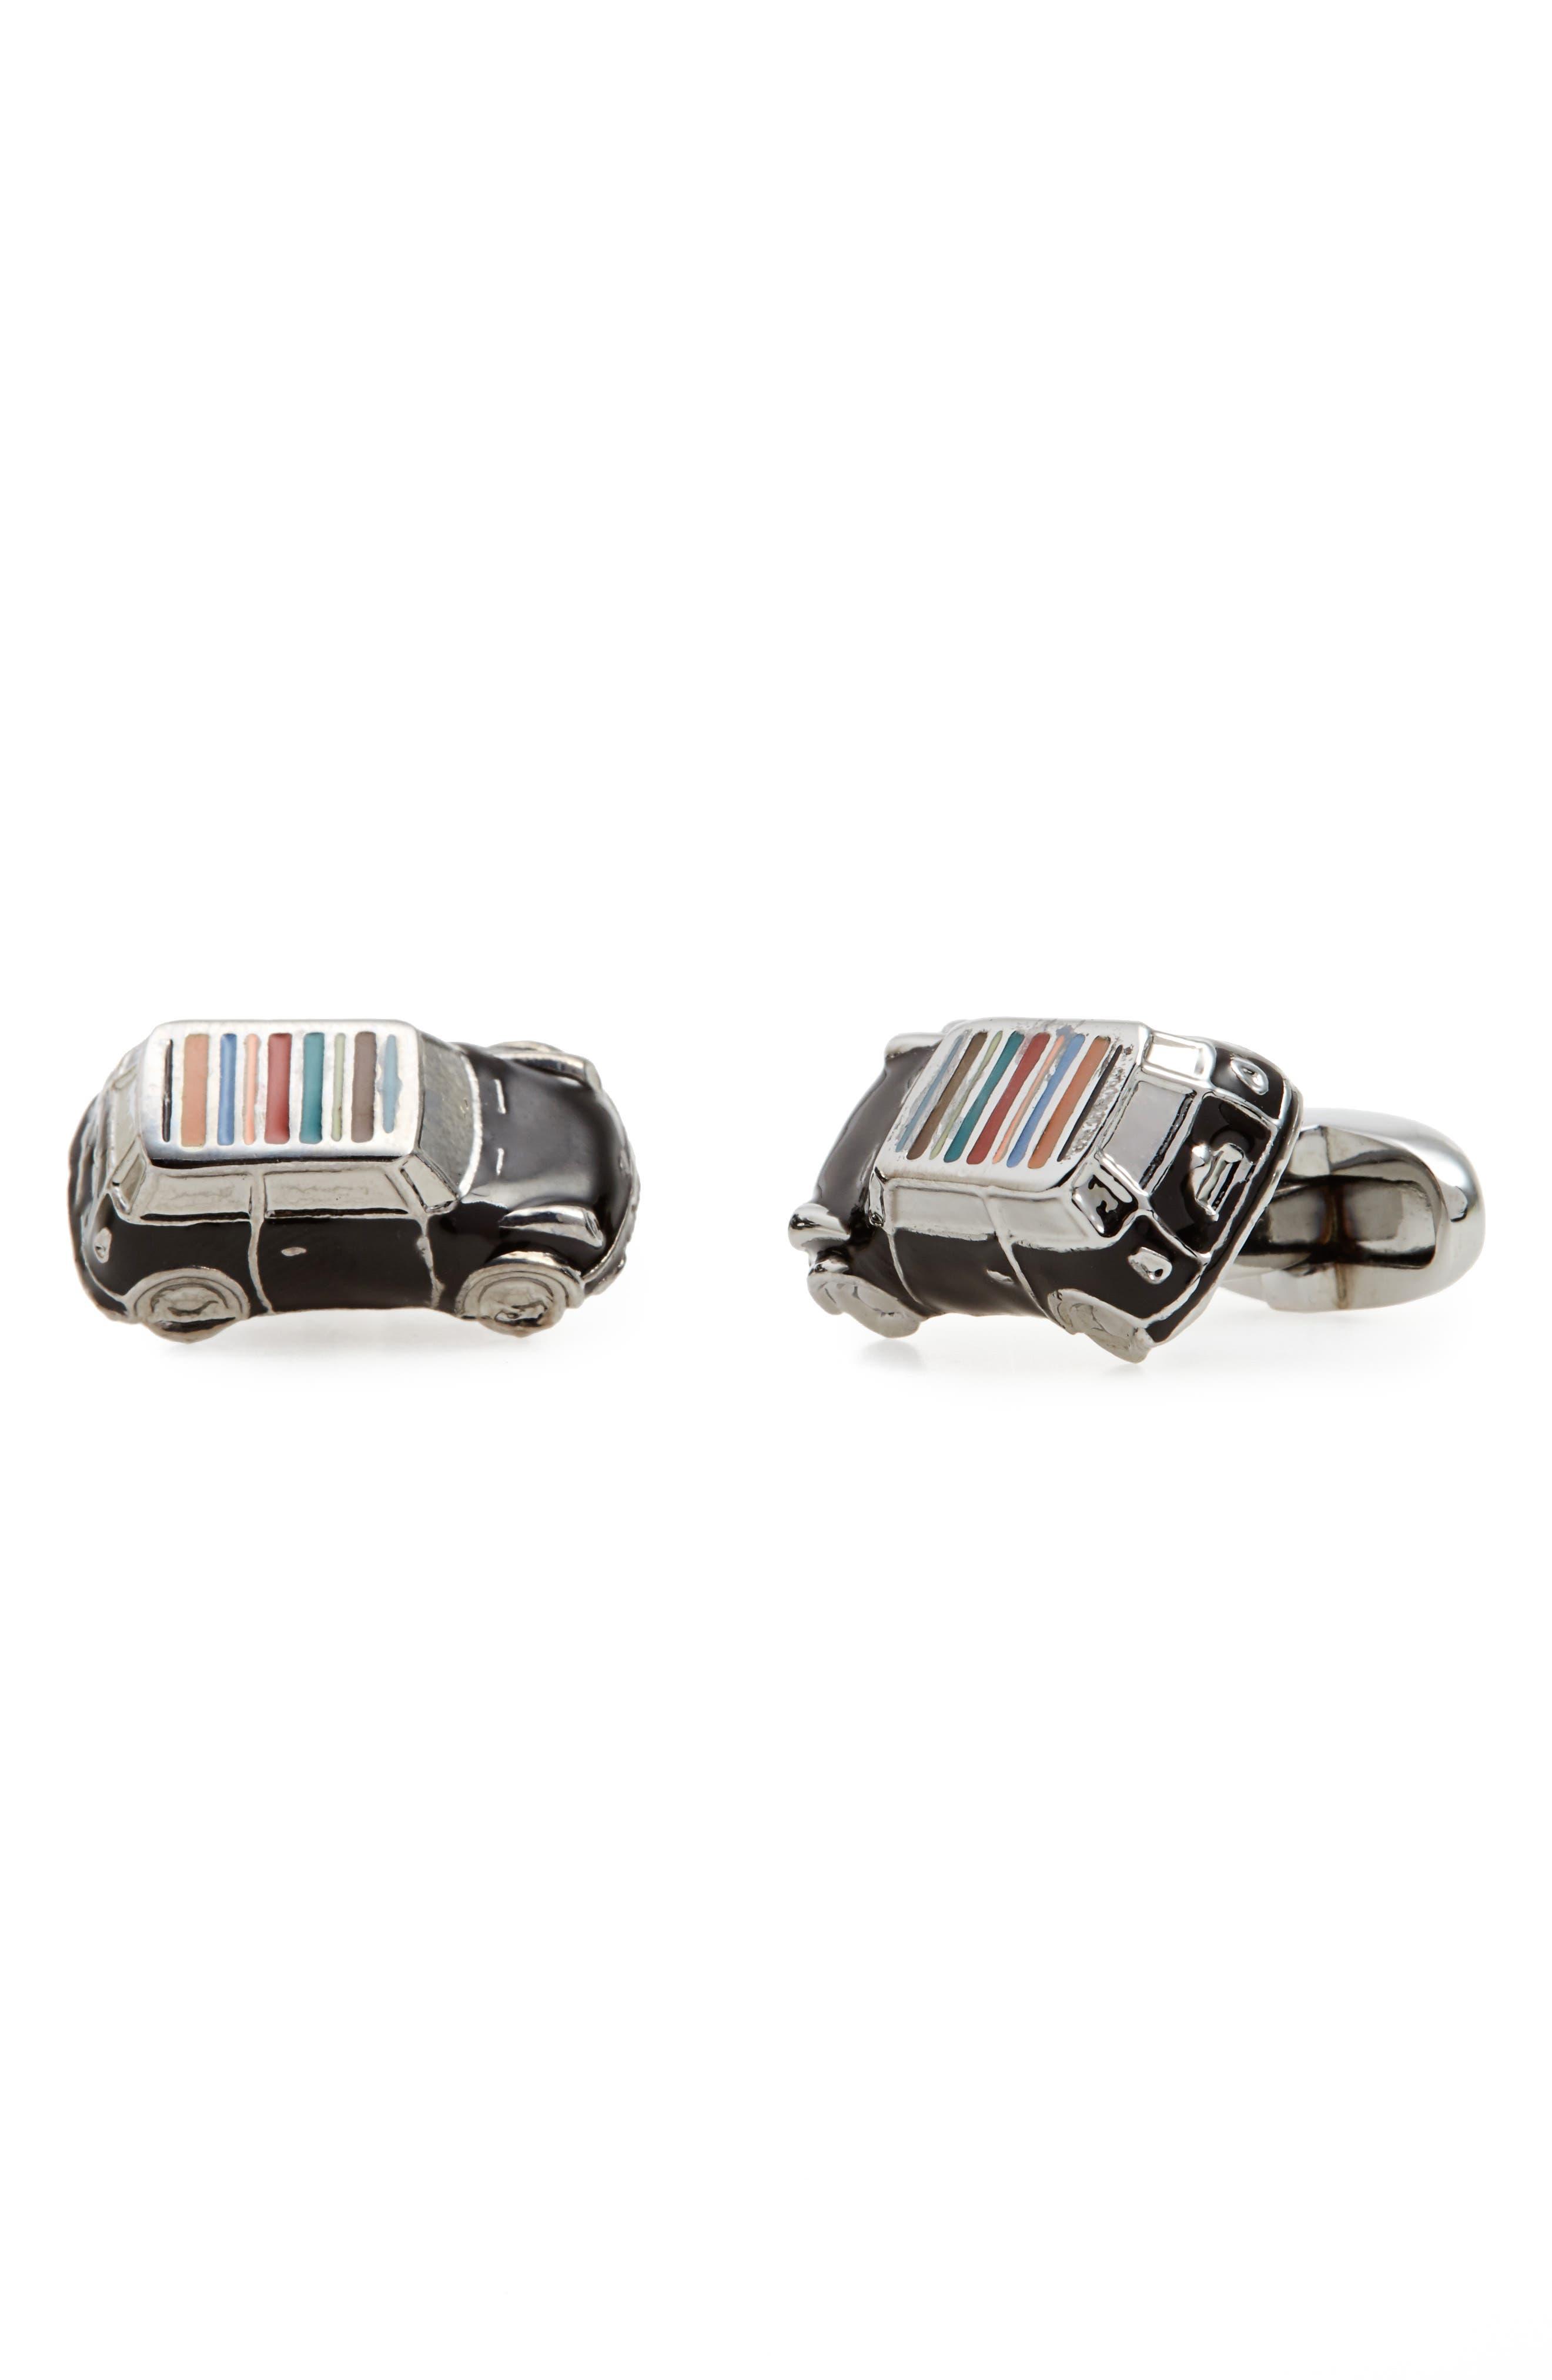 PAUL SMITH Enamel Stripe Car Cuff Links